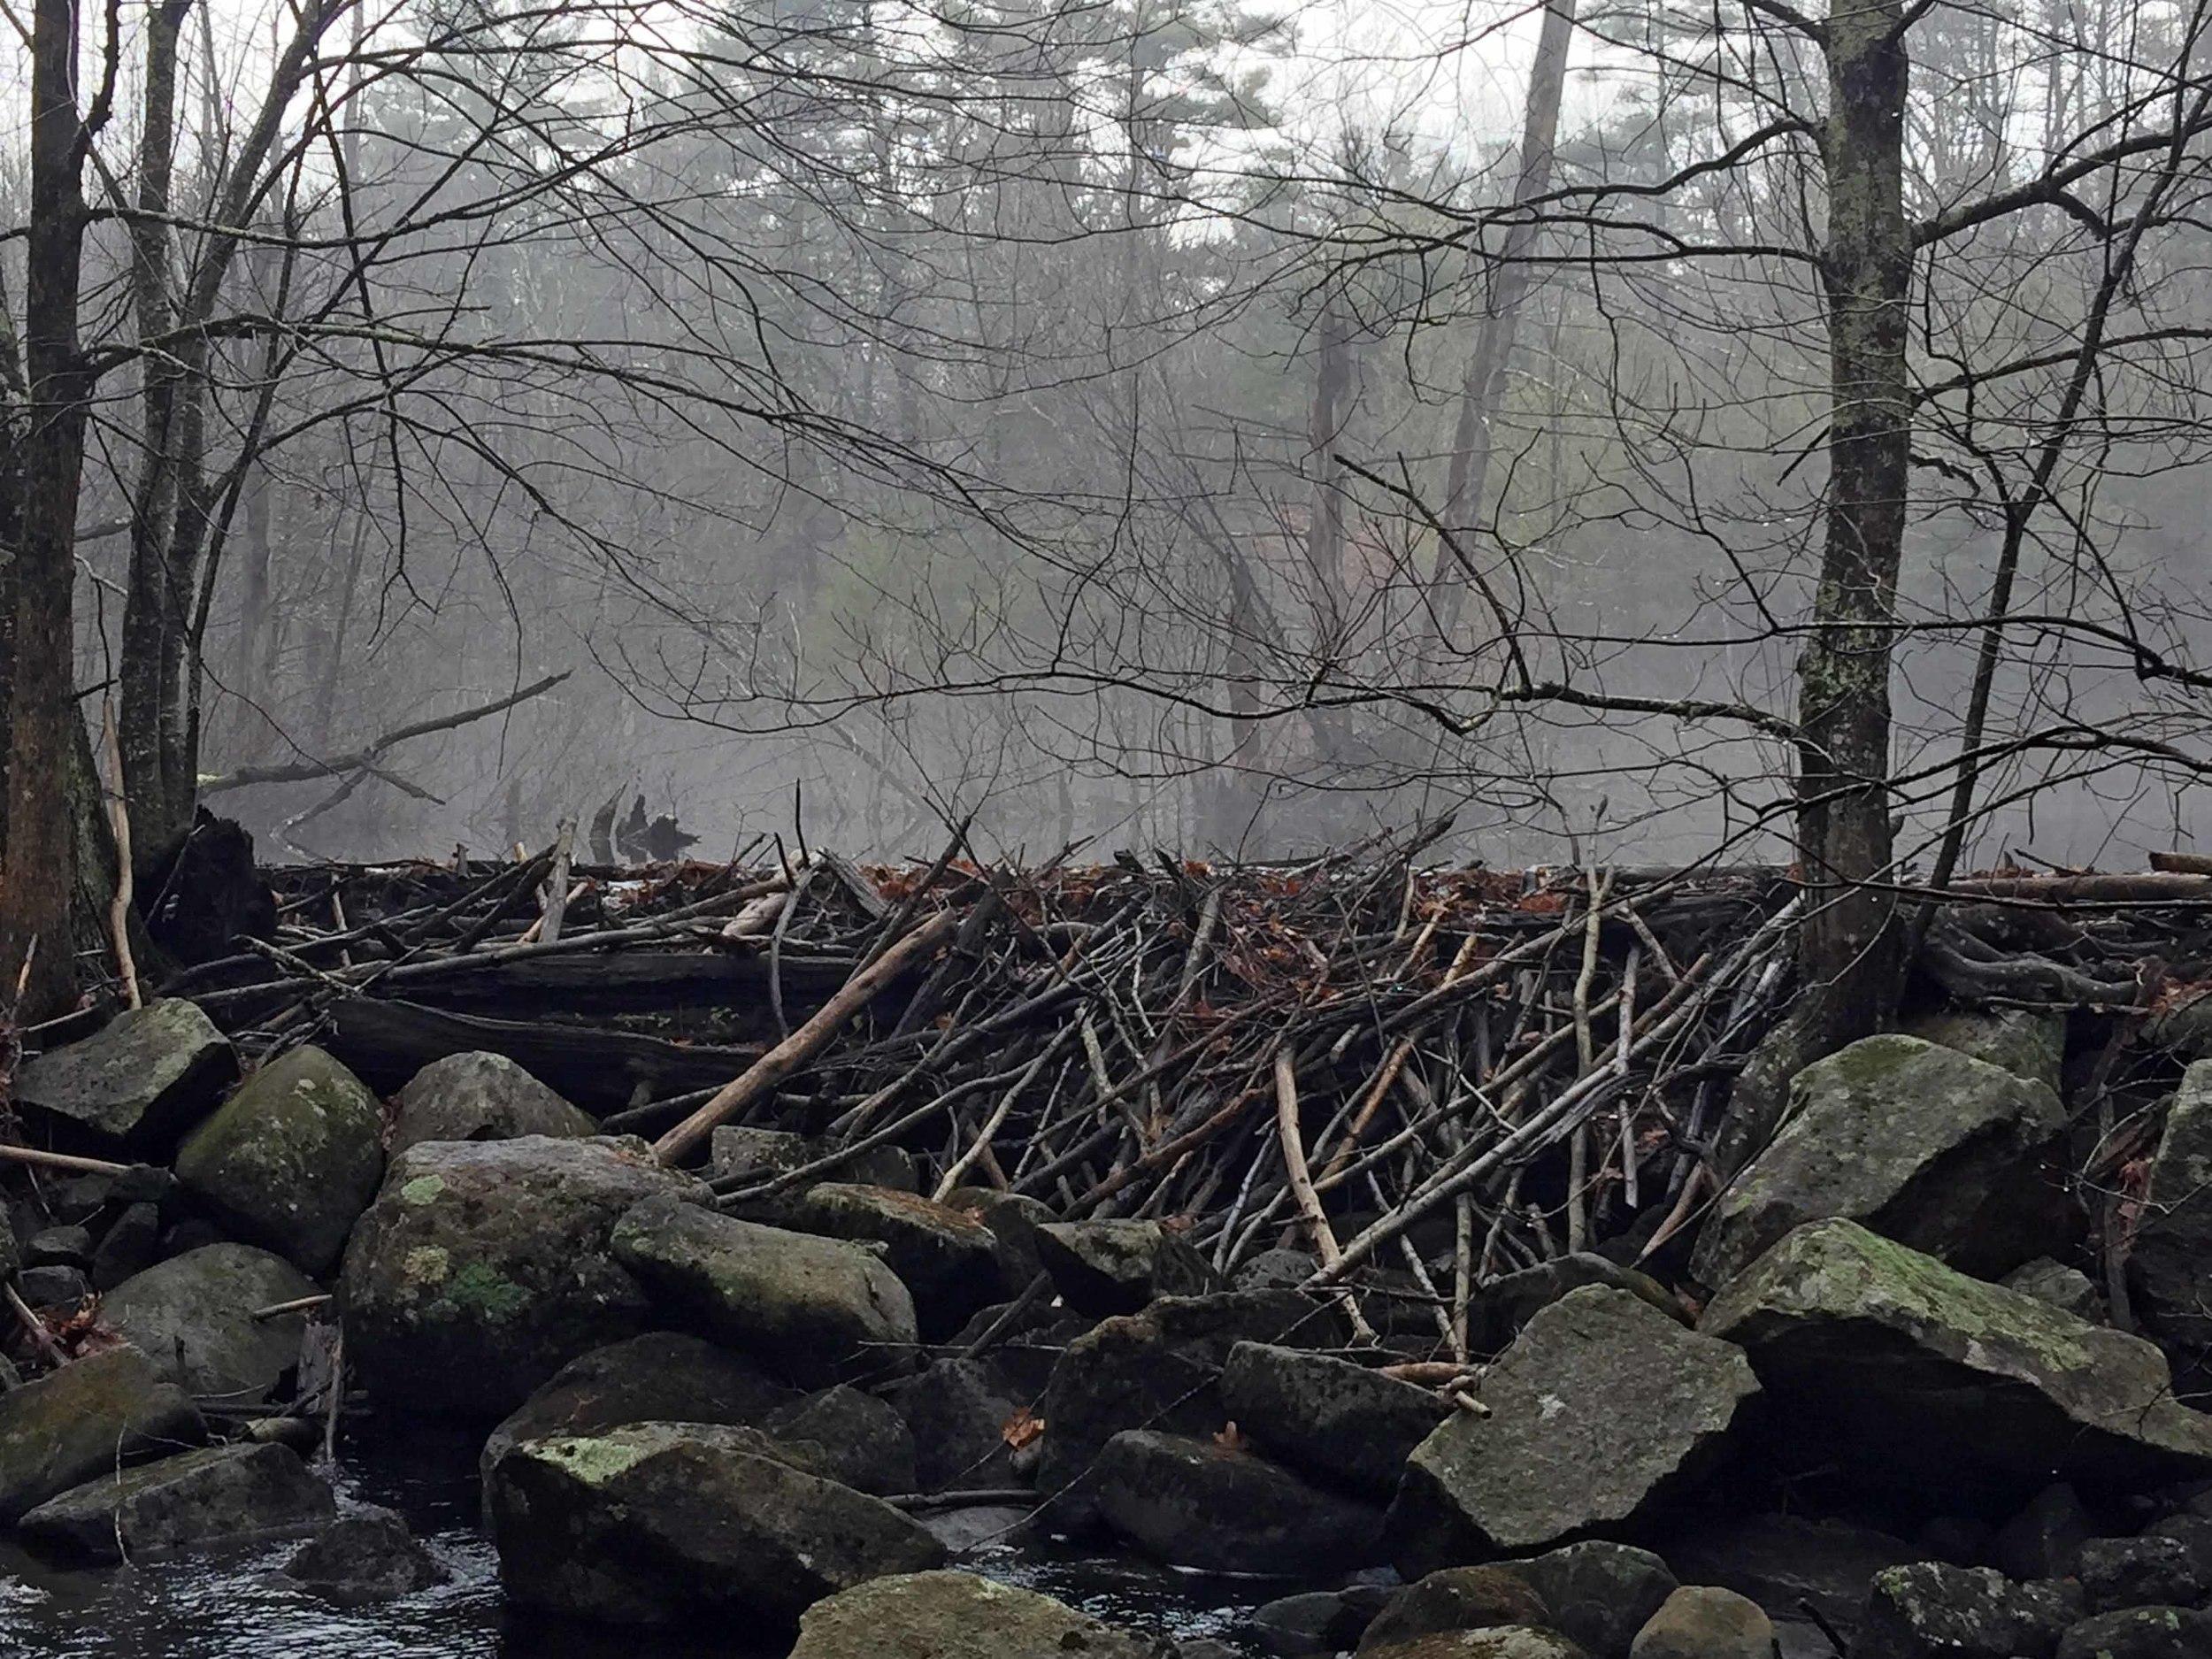 Beaver dam near Riddle Brook footbridge